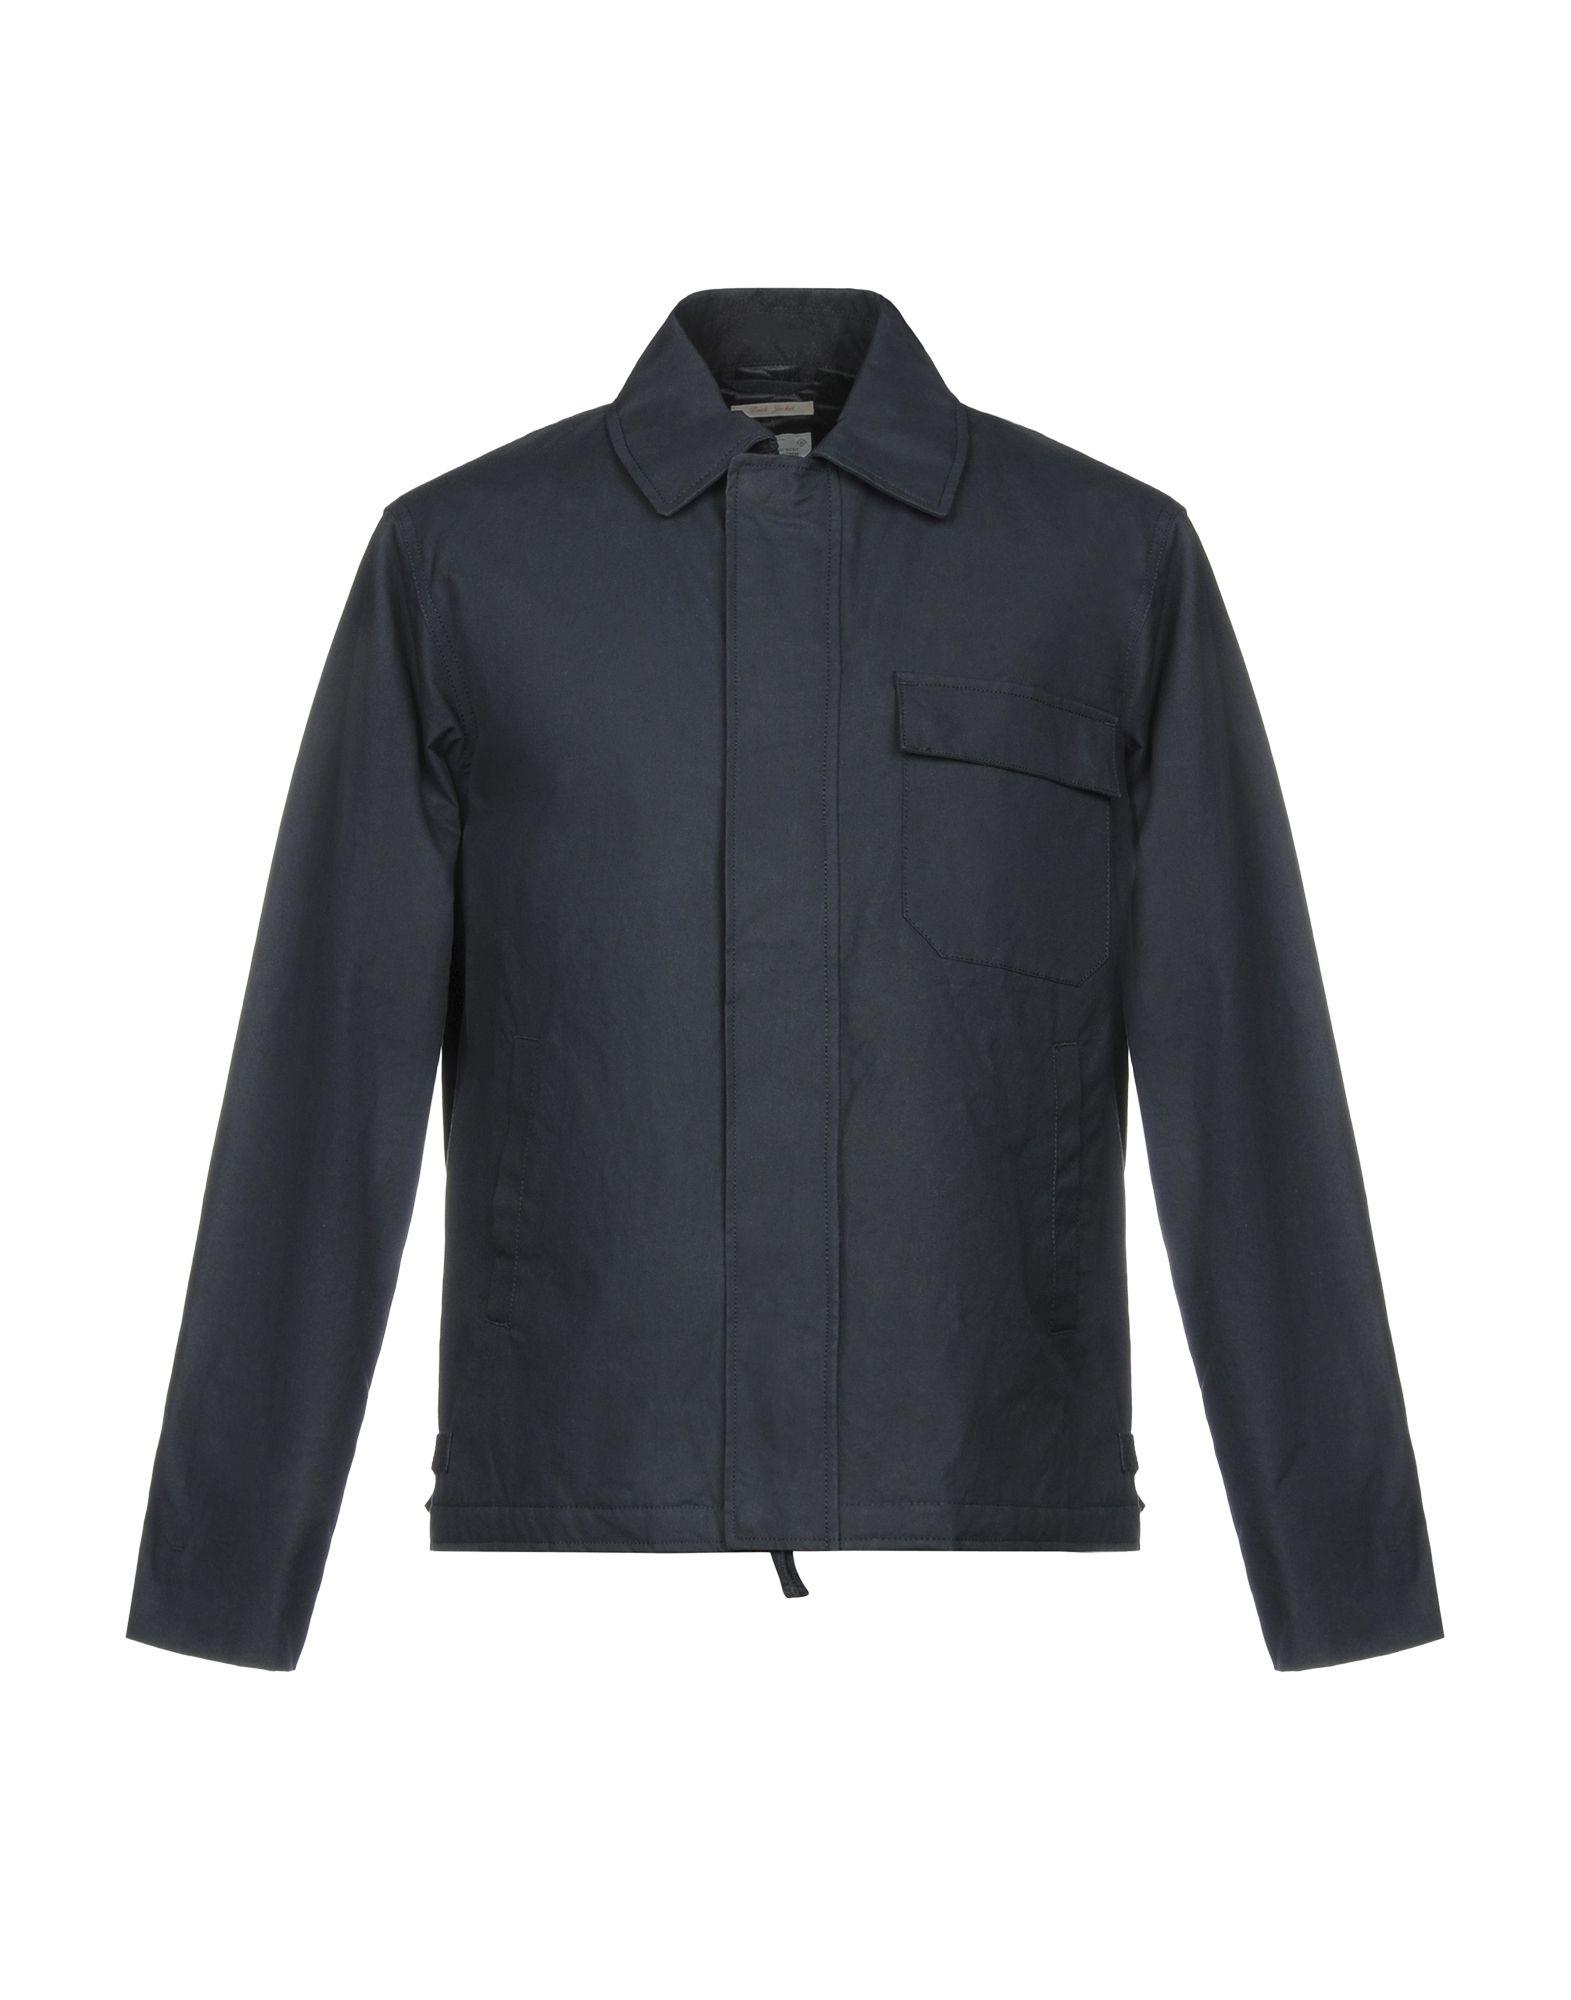 1f2c8cca764 Gant Rugger Jacket - Men Gant Rugger Jackets online on YOOX United ...